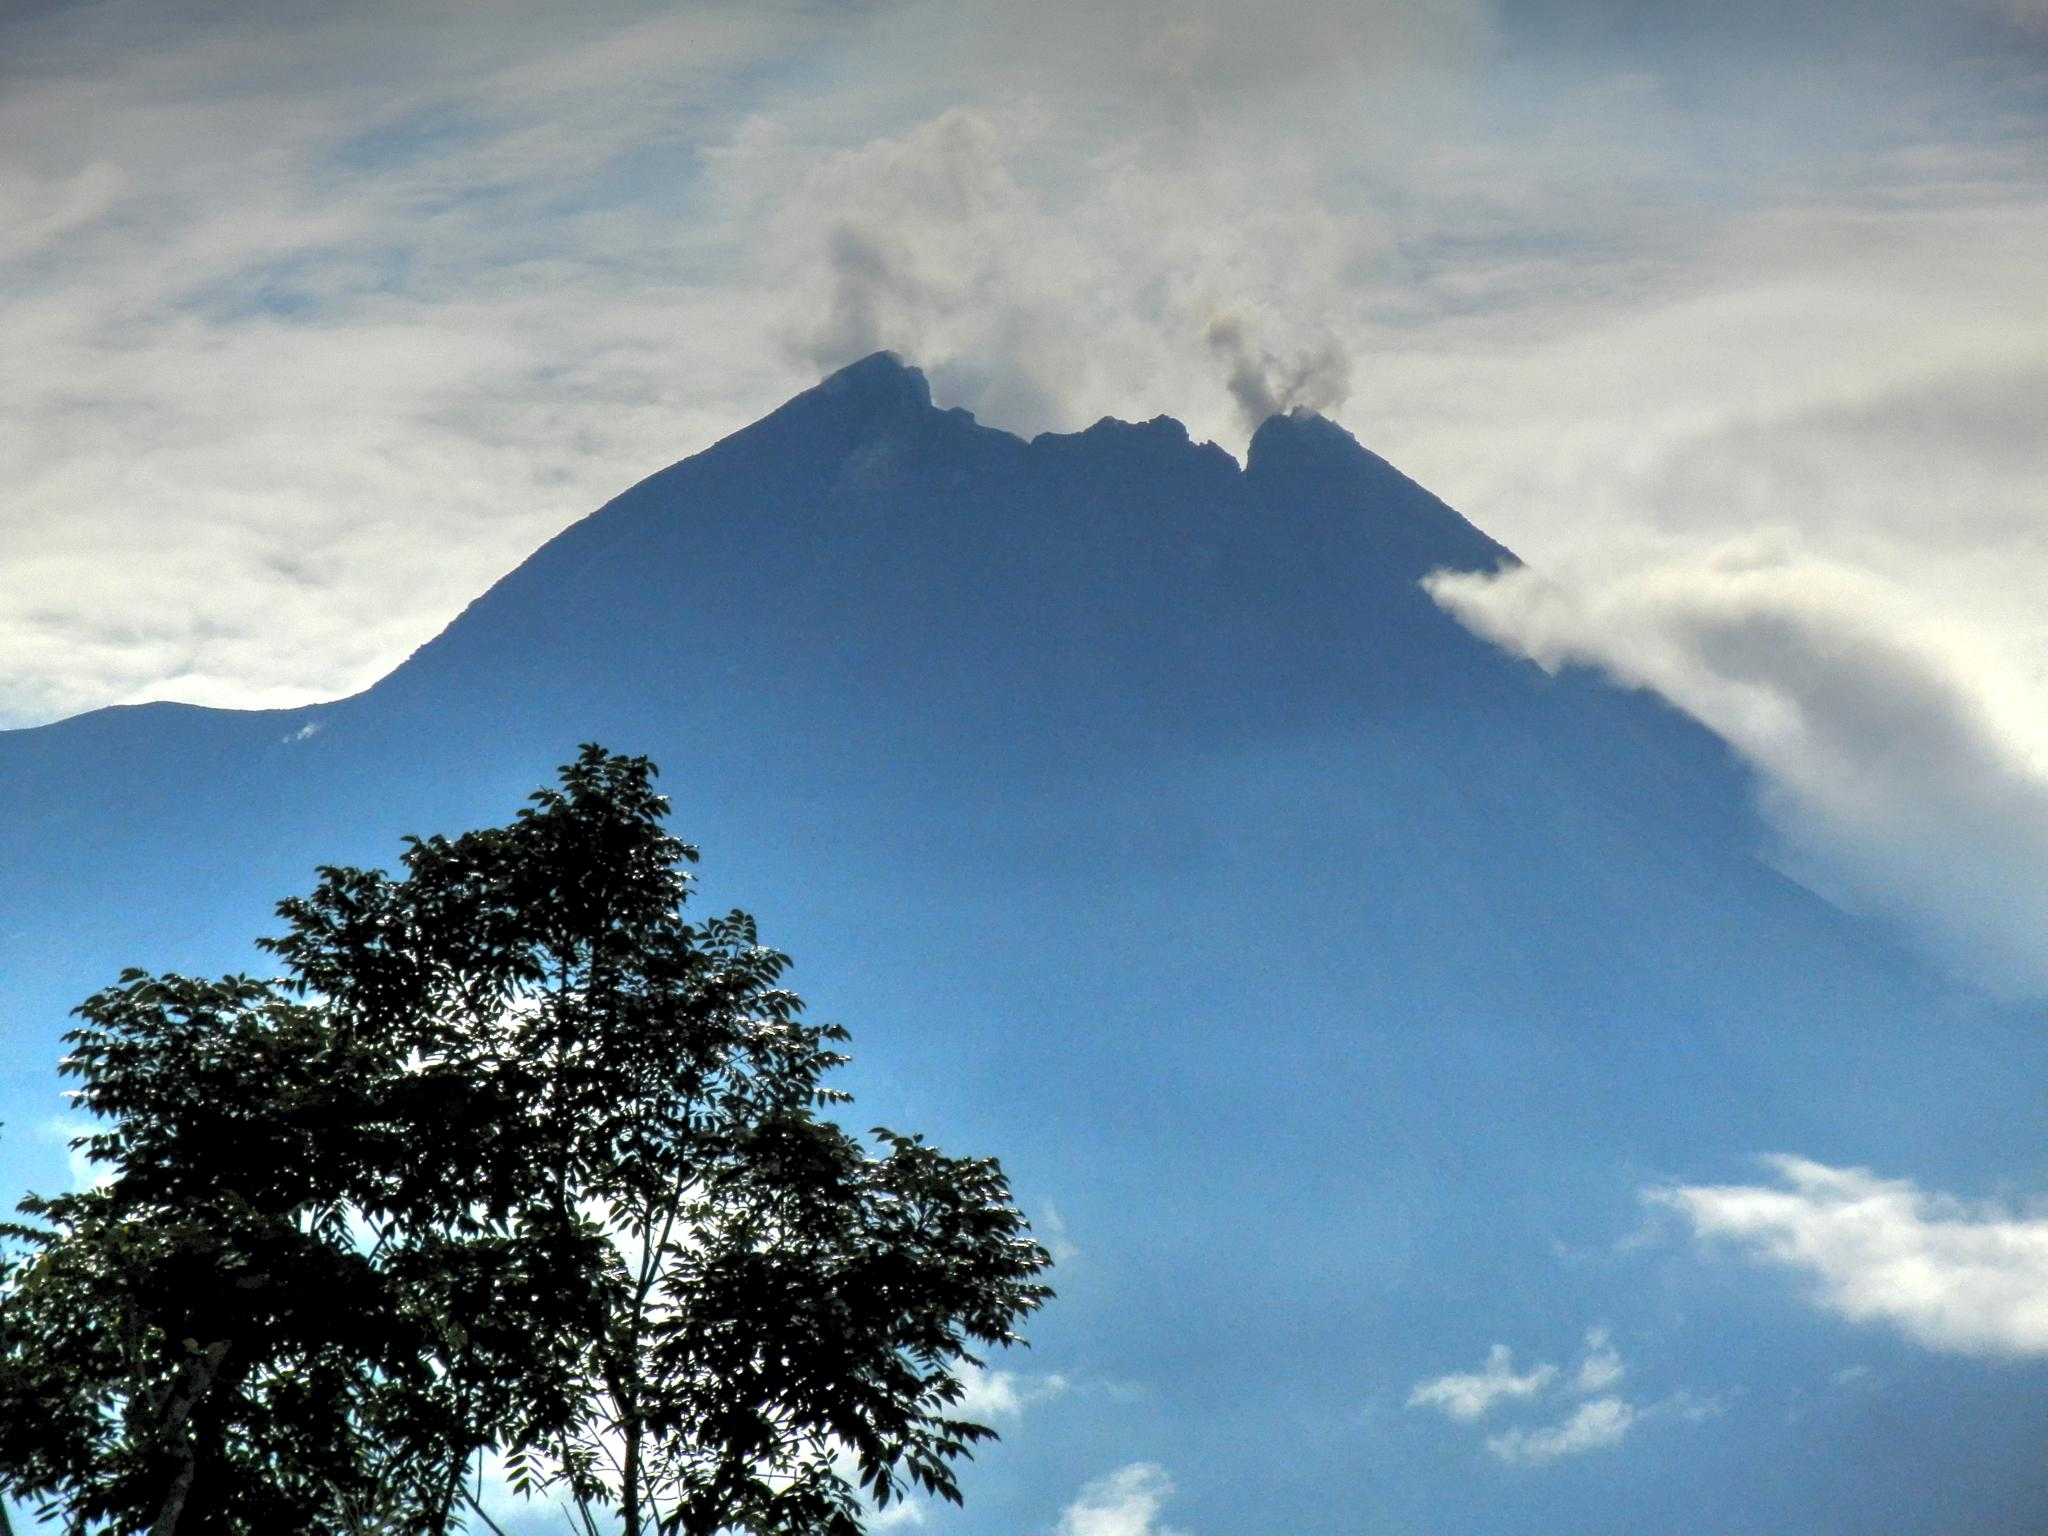 mt merapi from gantang village by Tonny Haryanto